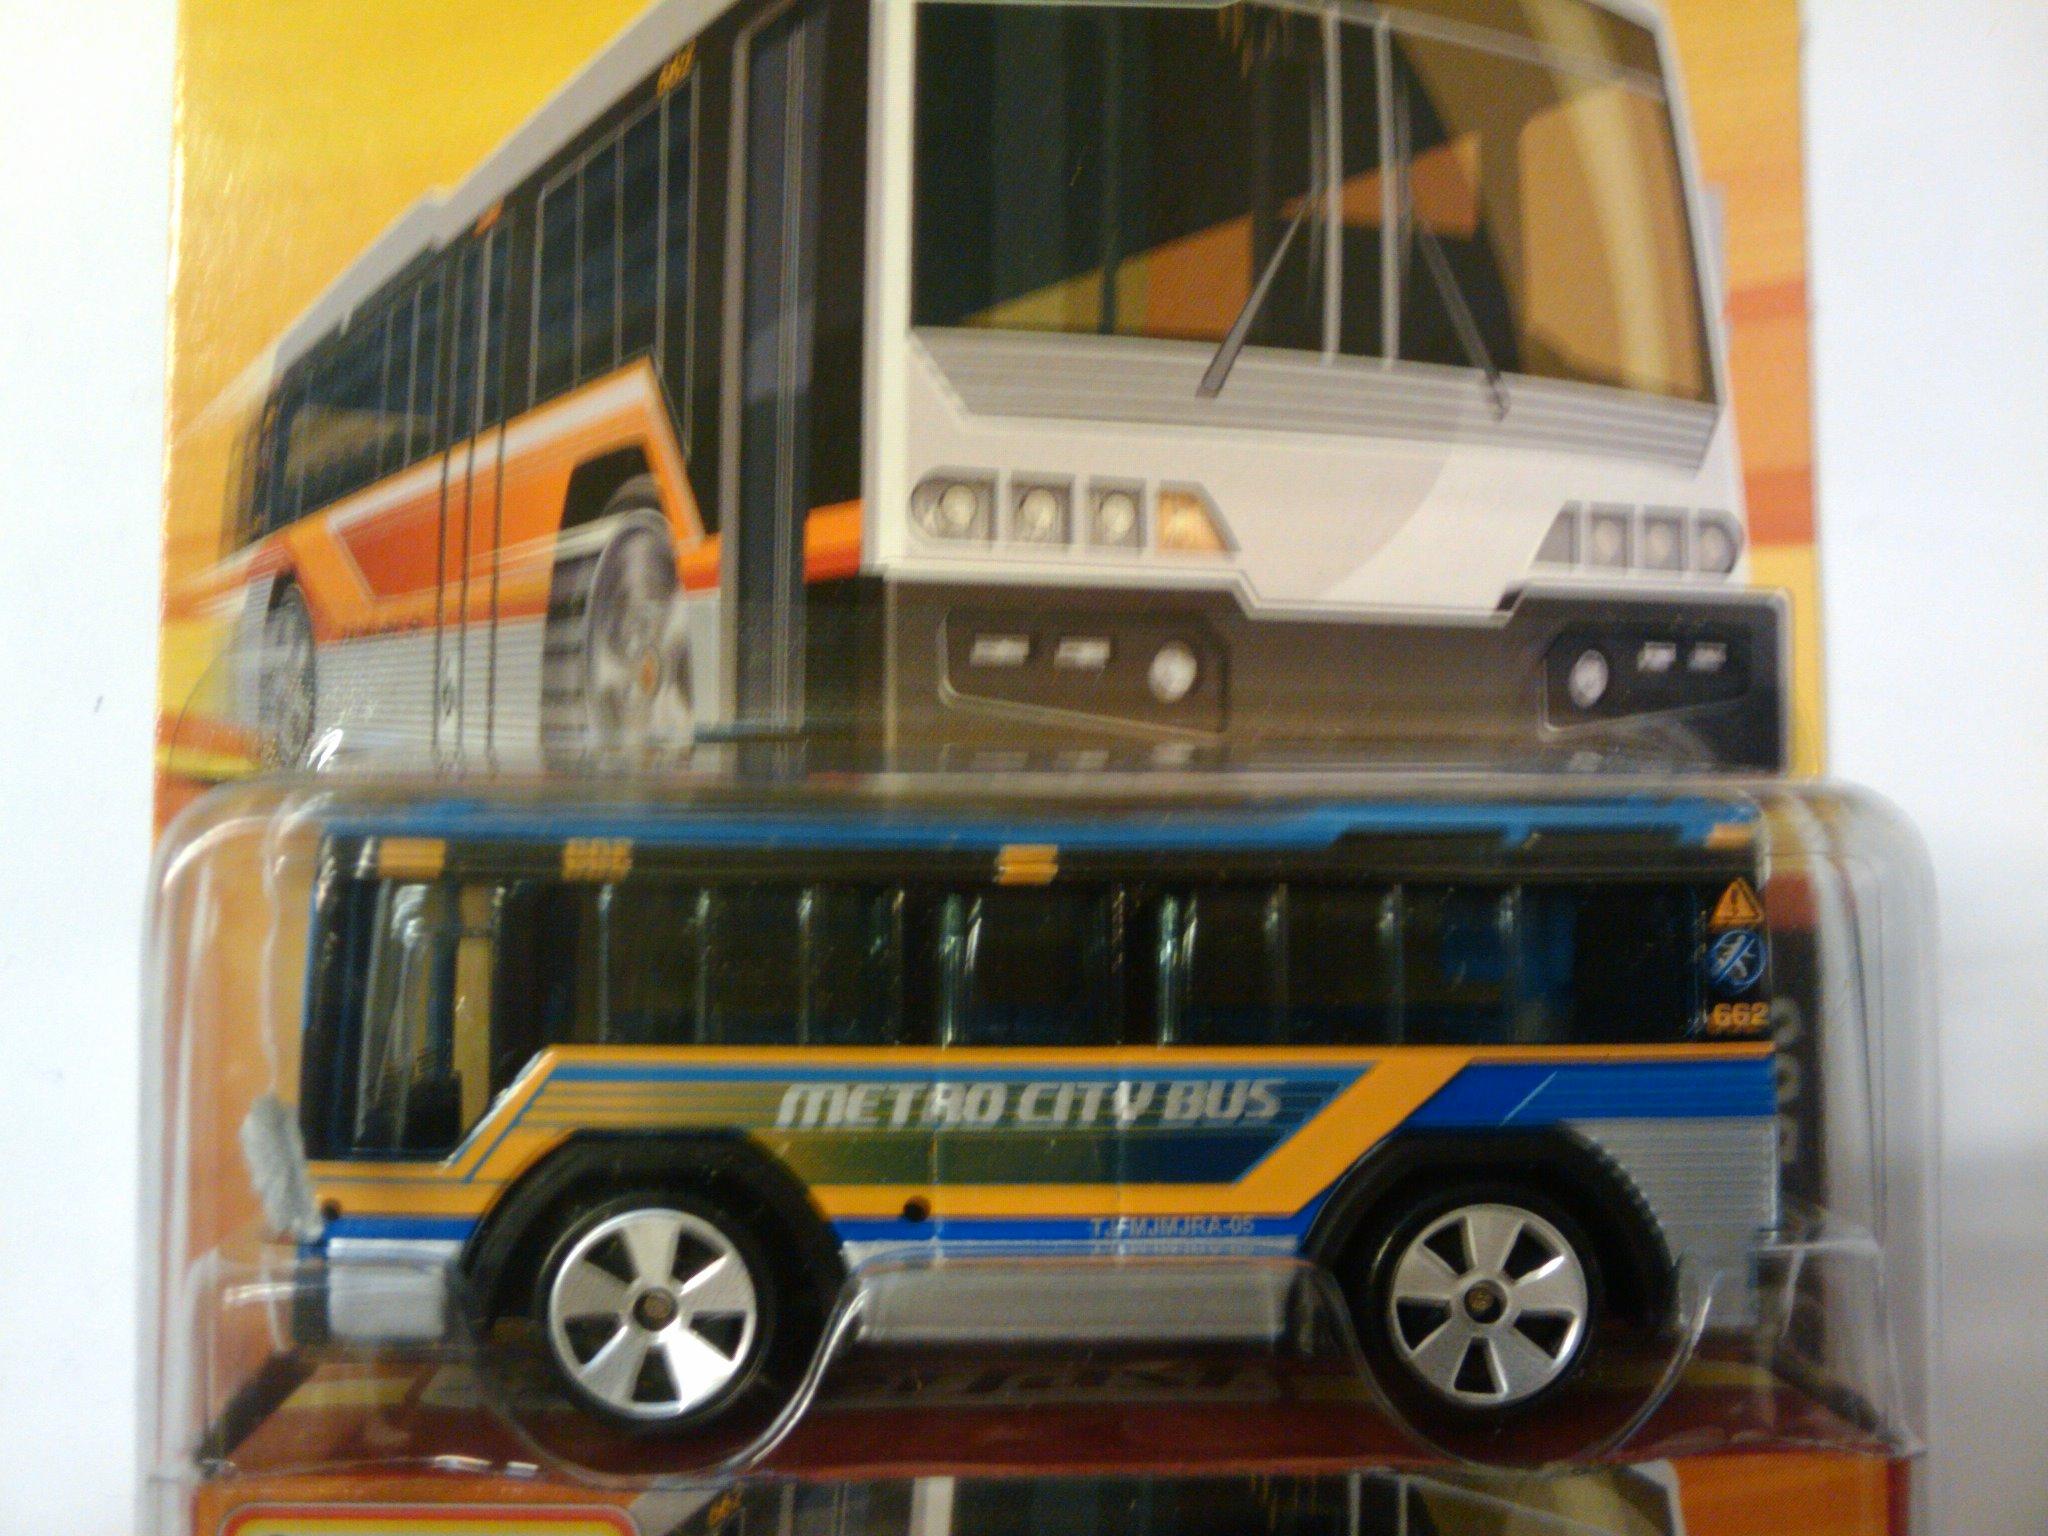 City Bus - Matchbox Cars Wiki